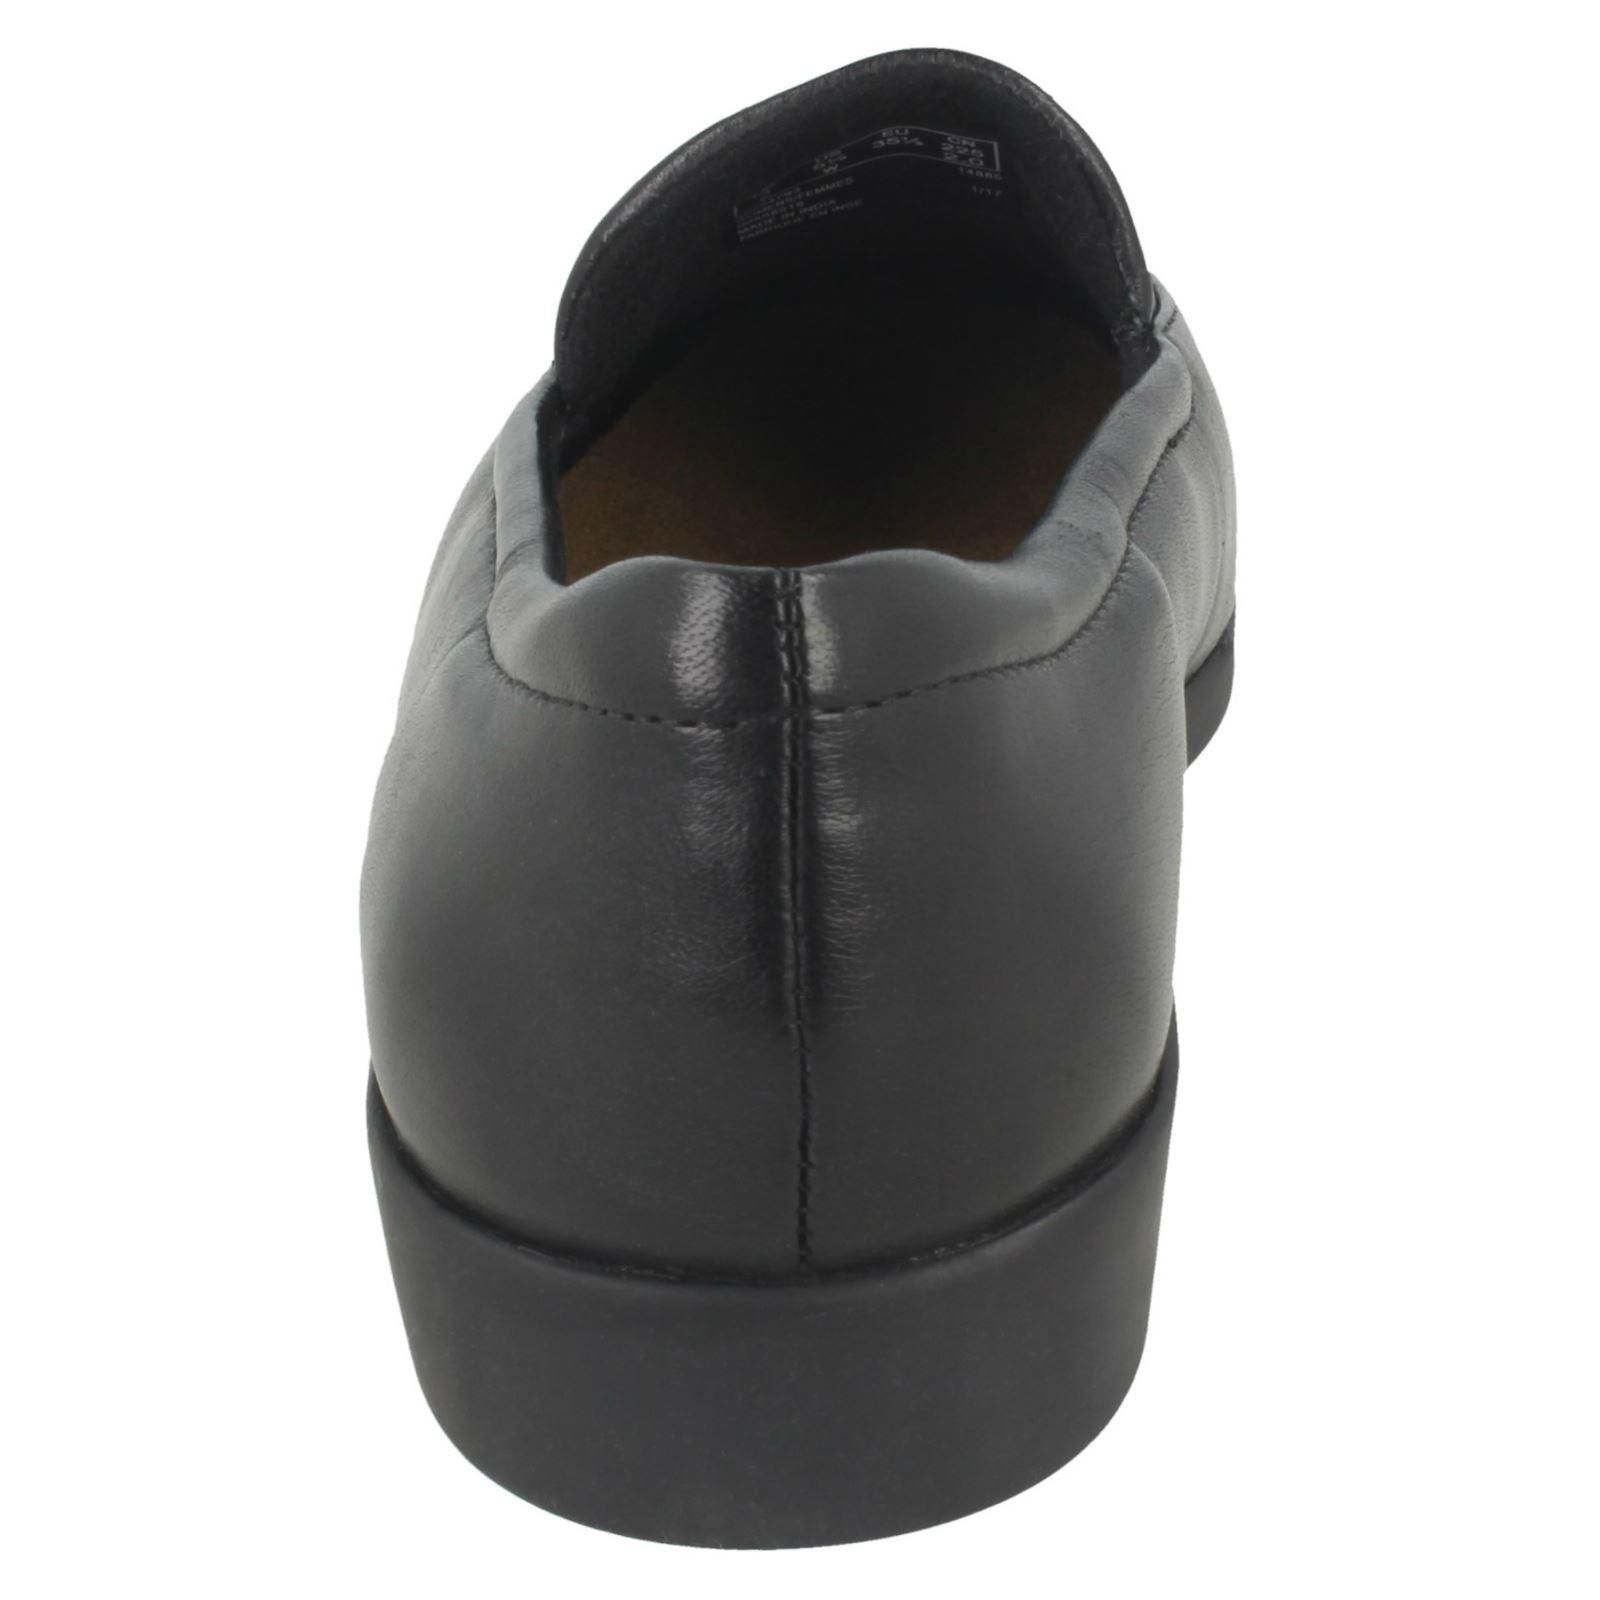 Clarks Pantuflas Estilo Bajas Georgia Mujer Zapatos dpTxwPYq